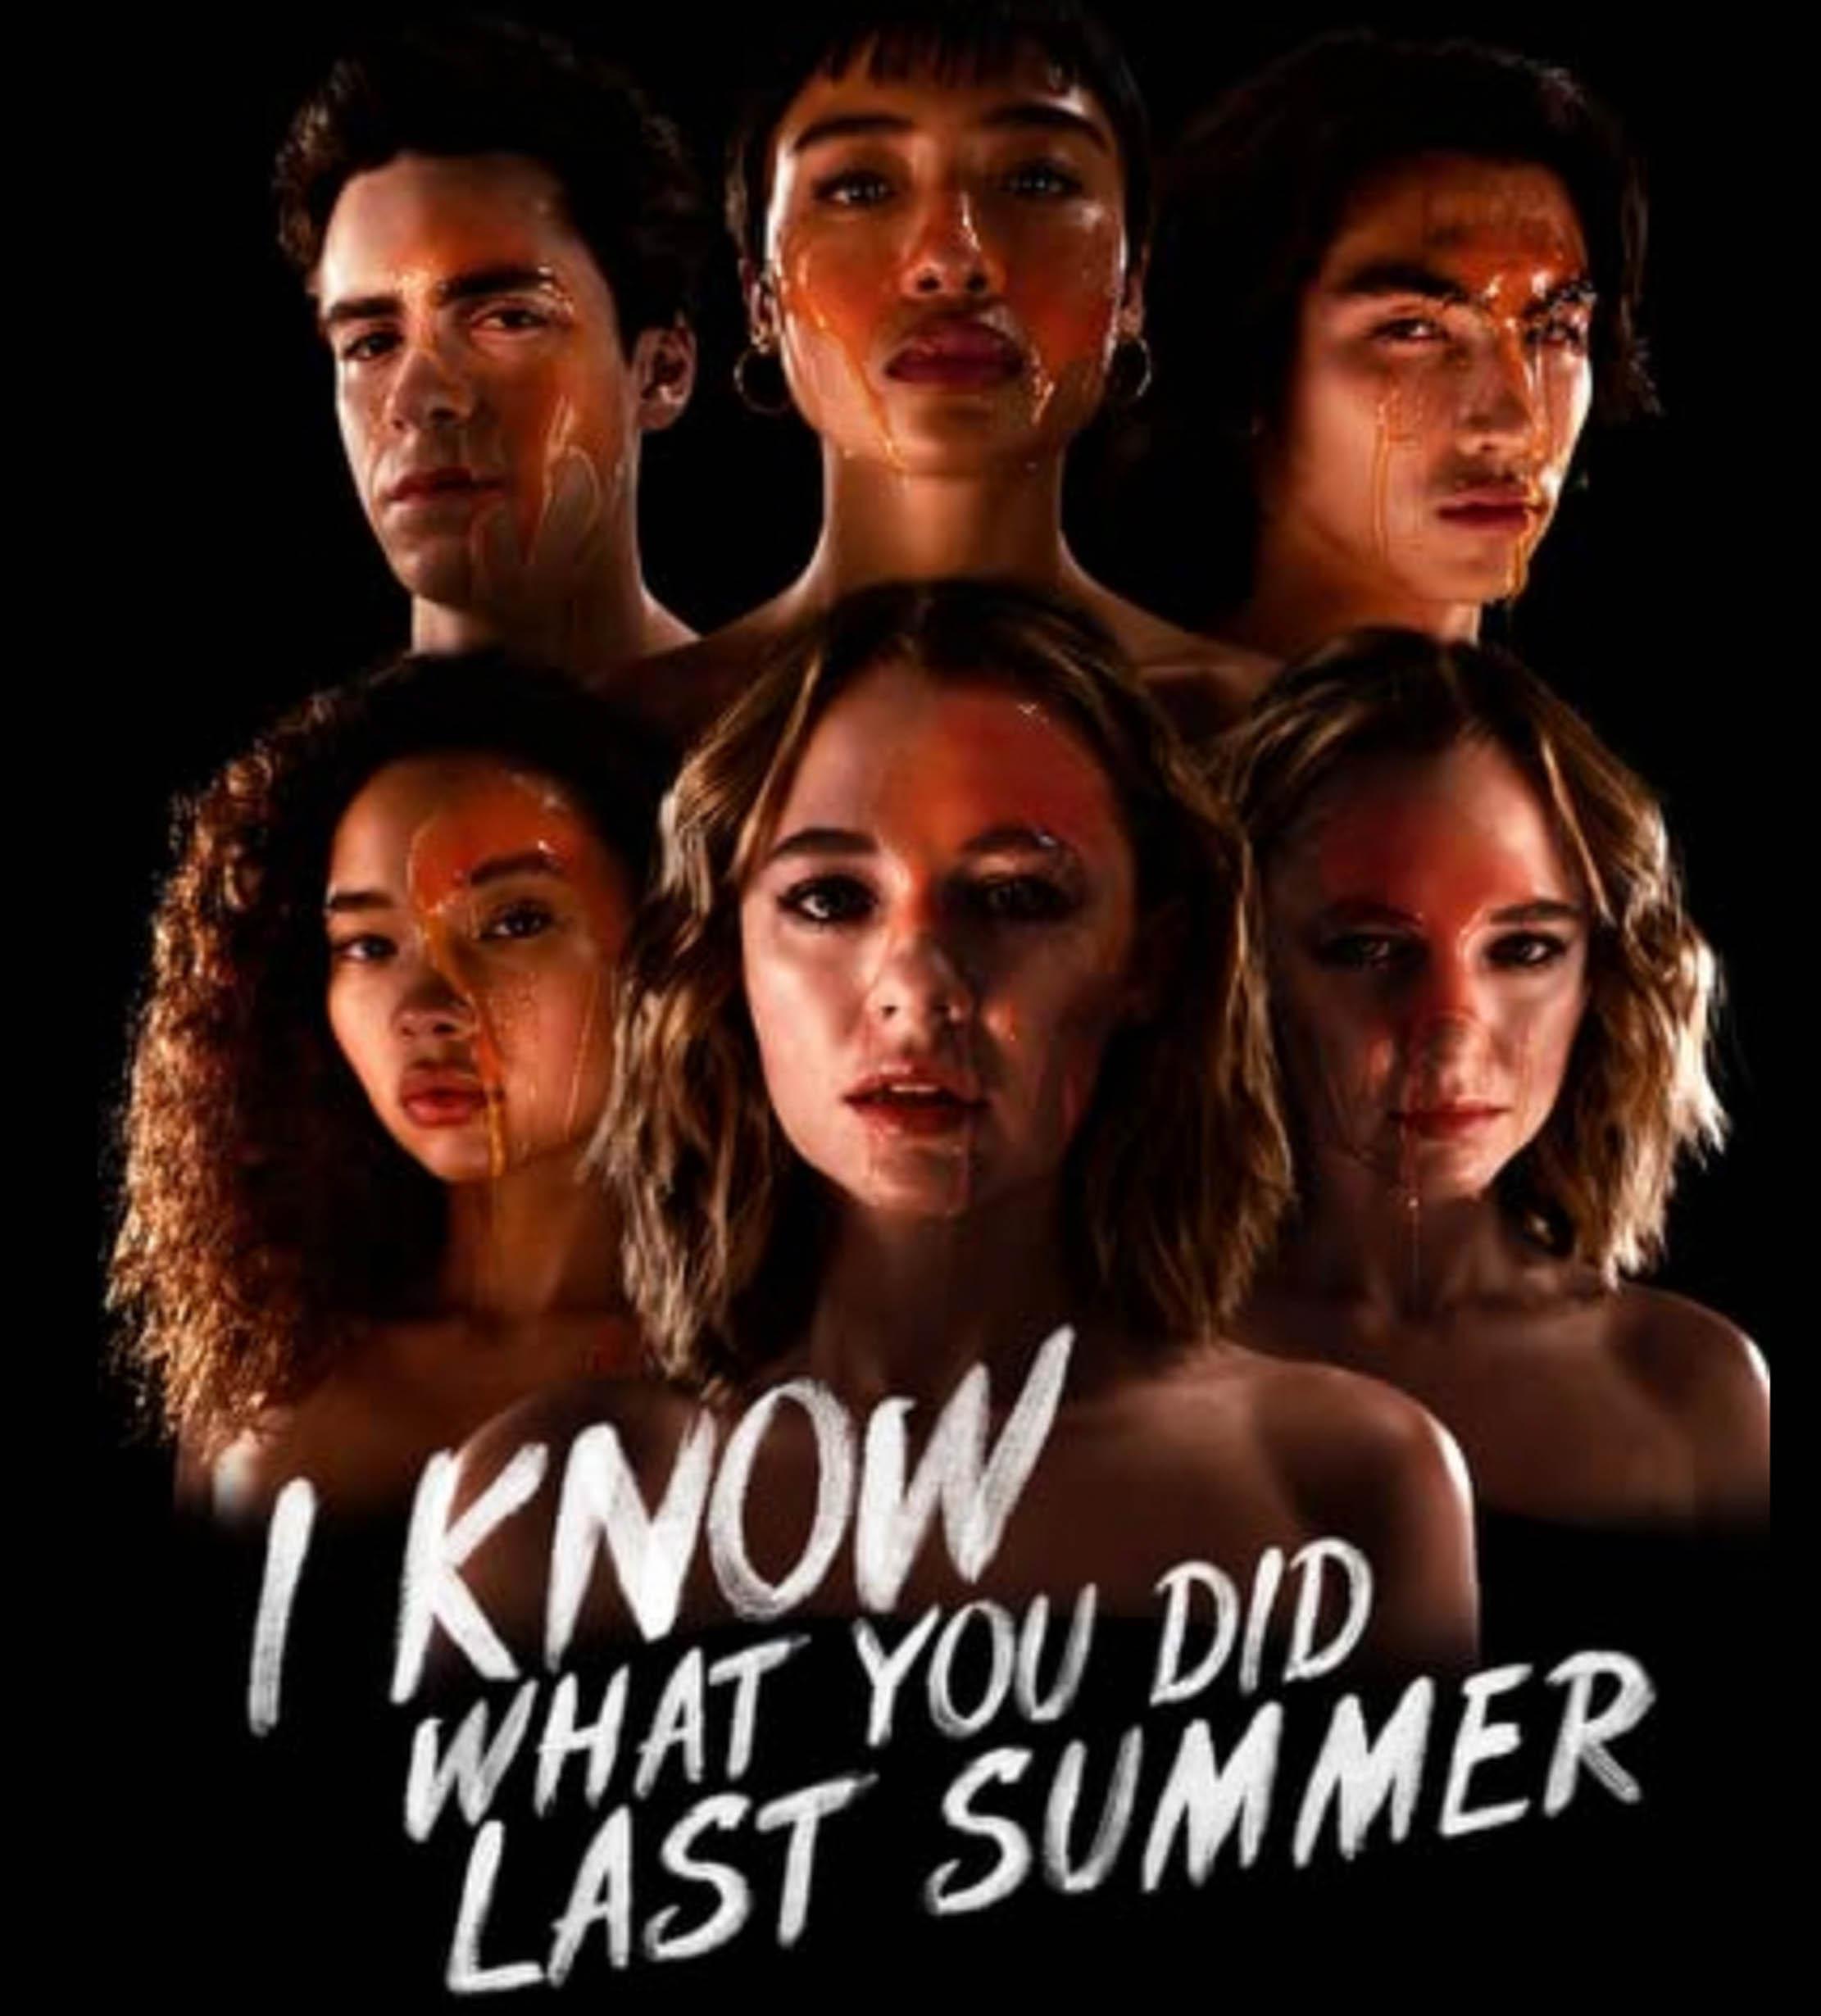 IKWYDLS 2021: Ezekiel Goodman, Brianne Tju, Sebastian Amoruso, Ashley Moore, Madison Iseman (Prime Video)